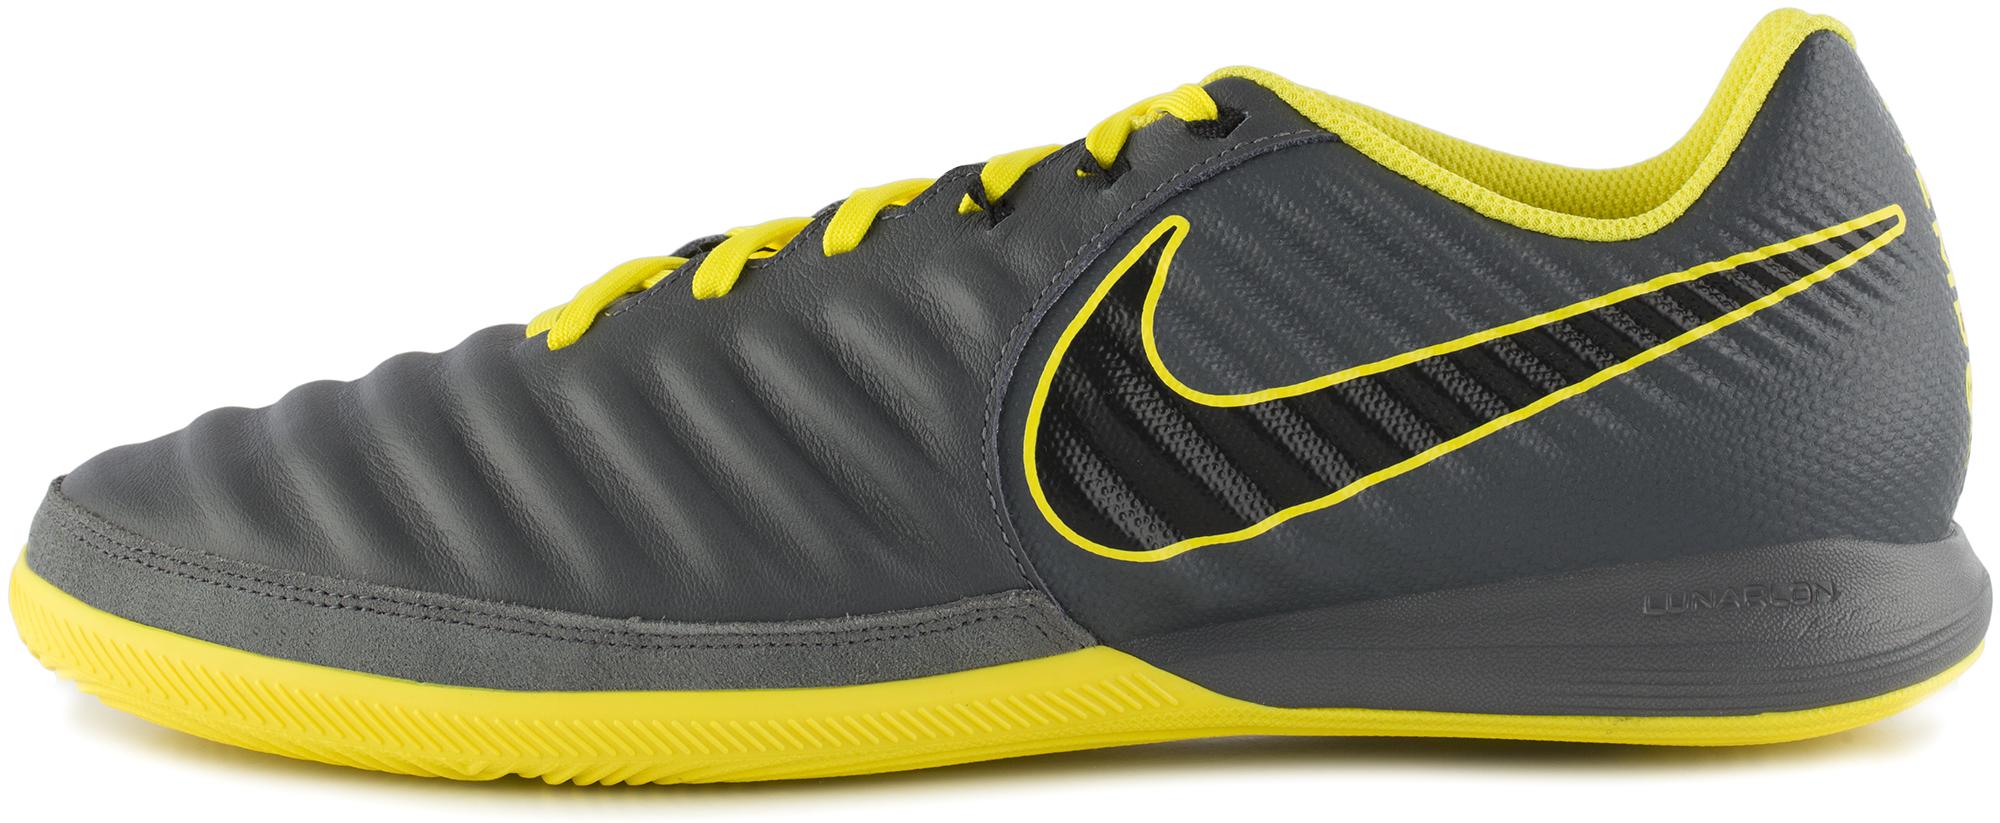 Nike Бутсы мужские Nike Lunar Legend 7 Pro IC, размер 44 цена 2017